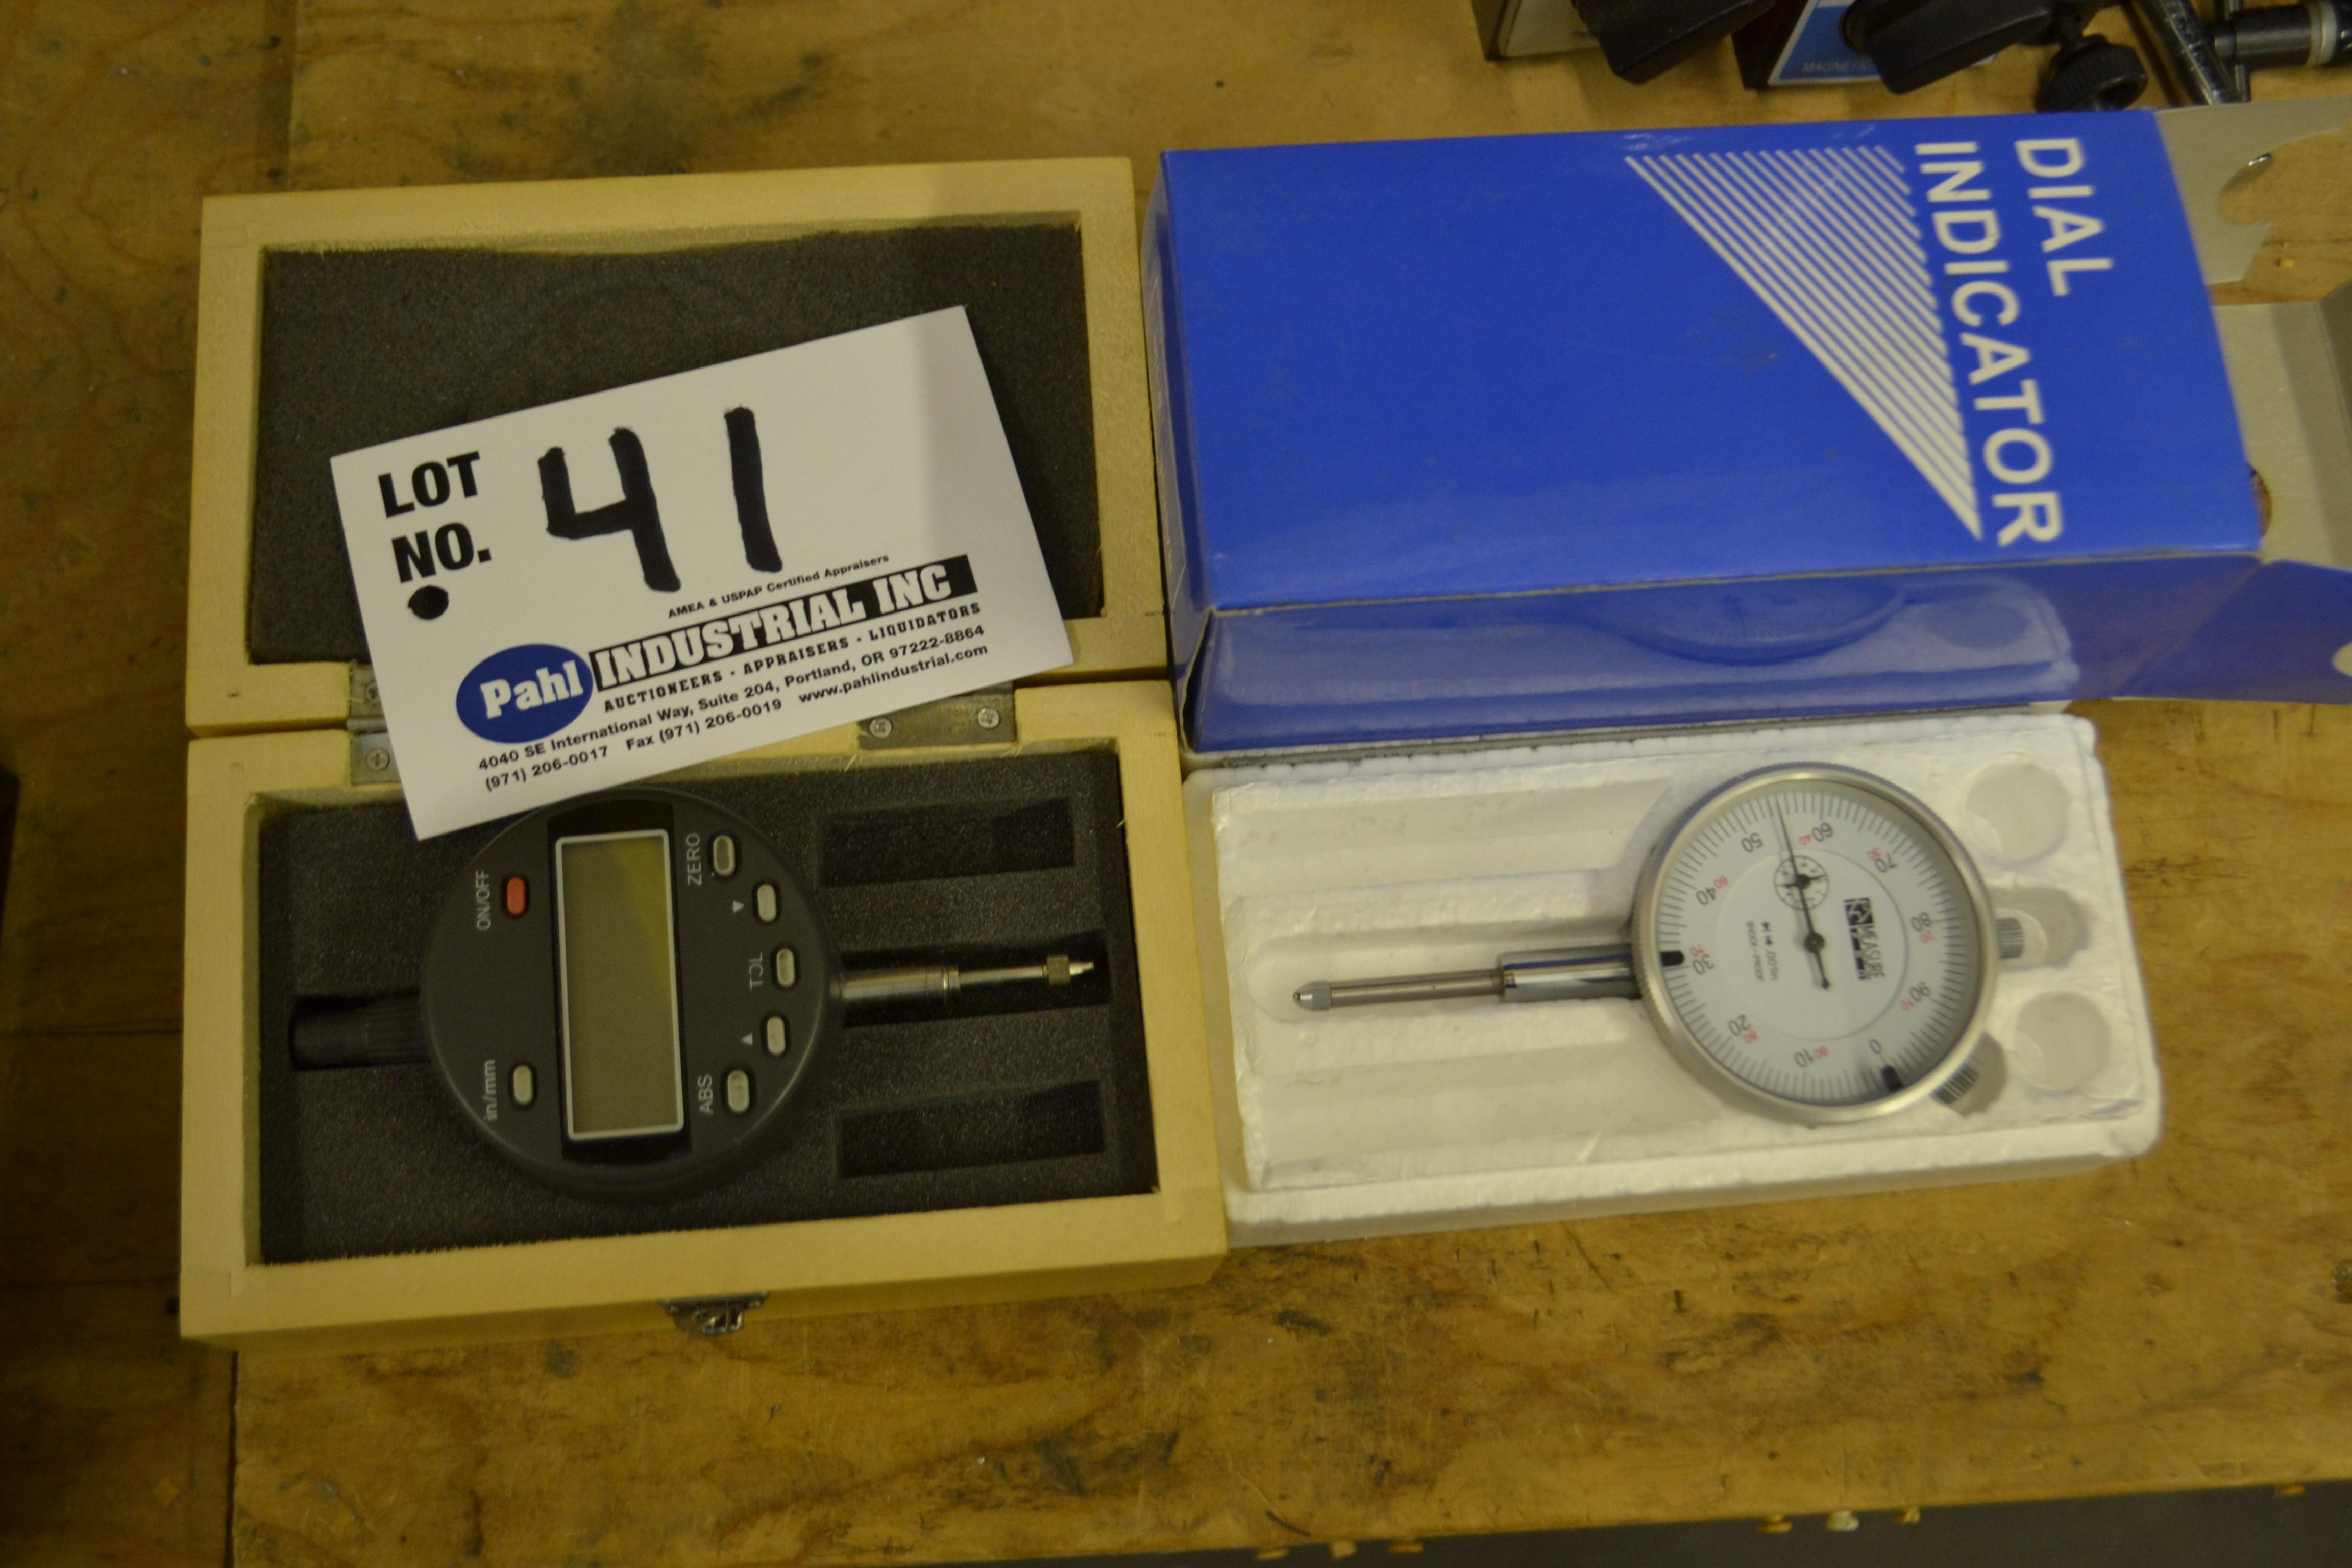 Electronic Digital Indicator and Dial Indicator